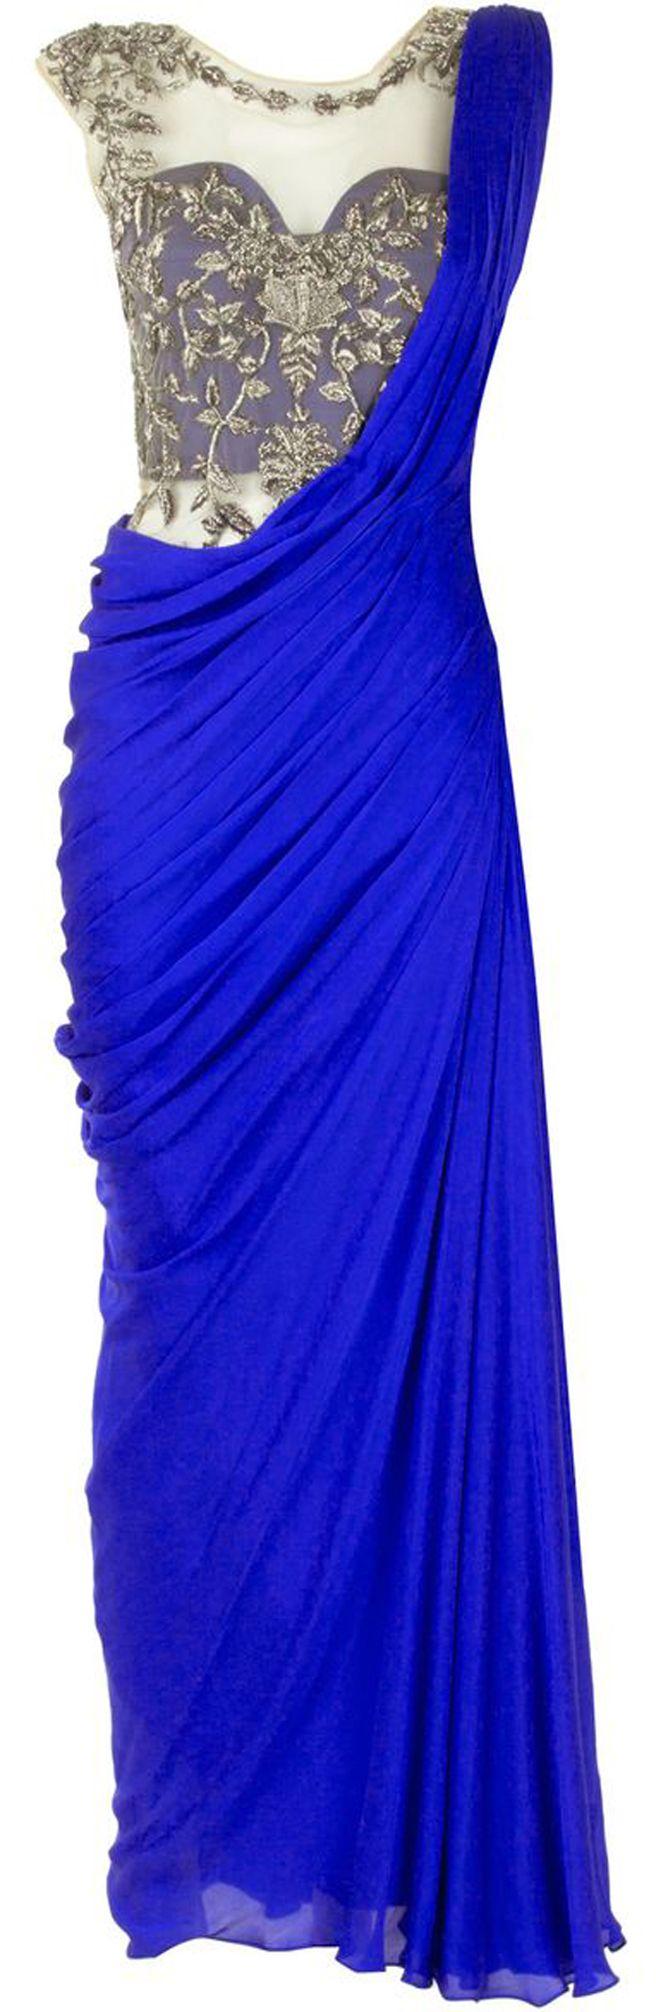 SONAAKSHI RAAJ Royal blue embroidered sari gown